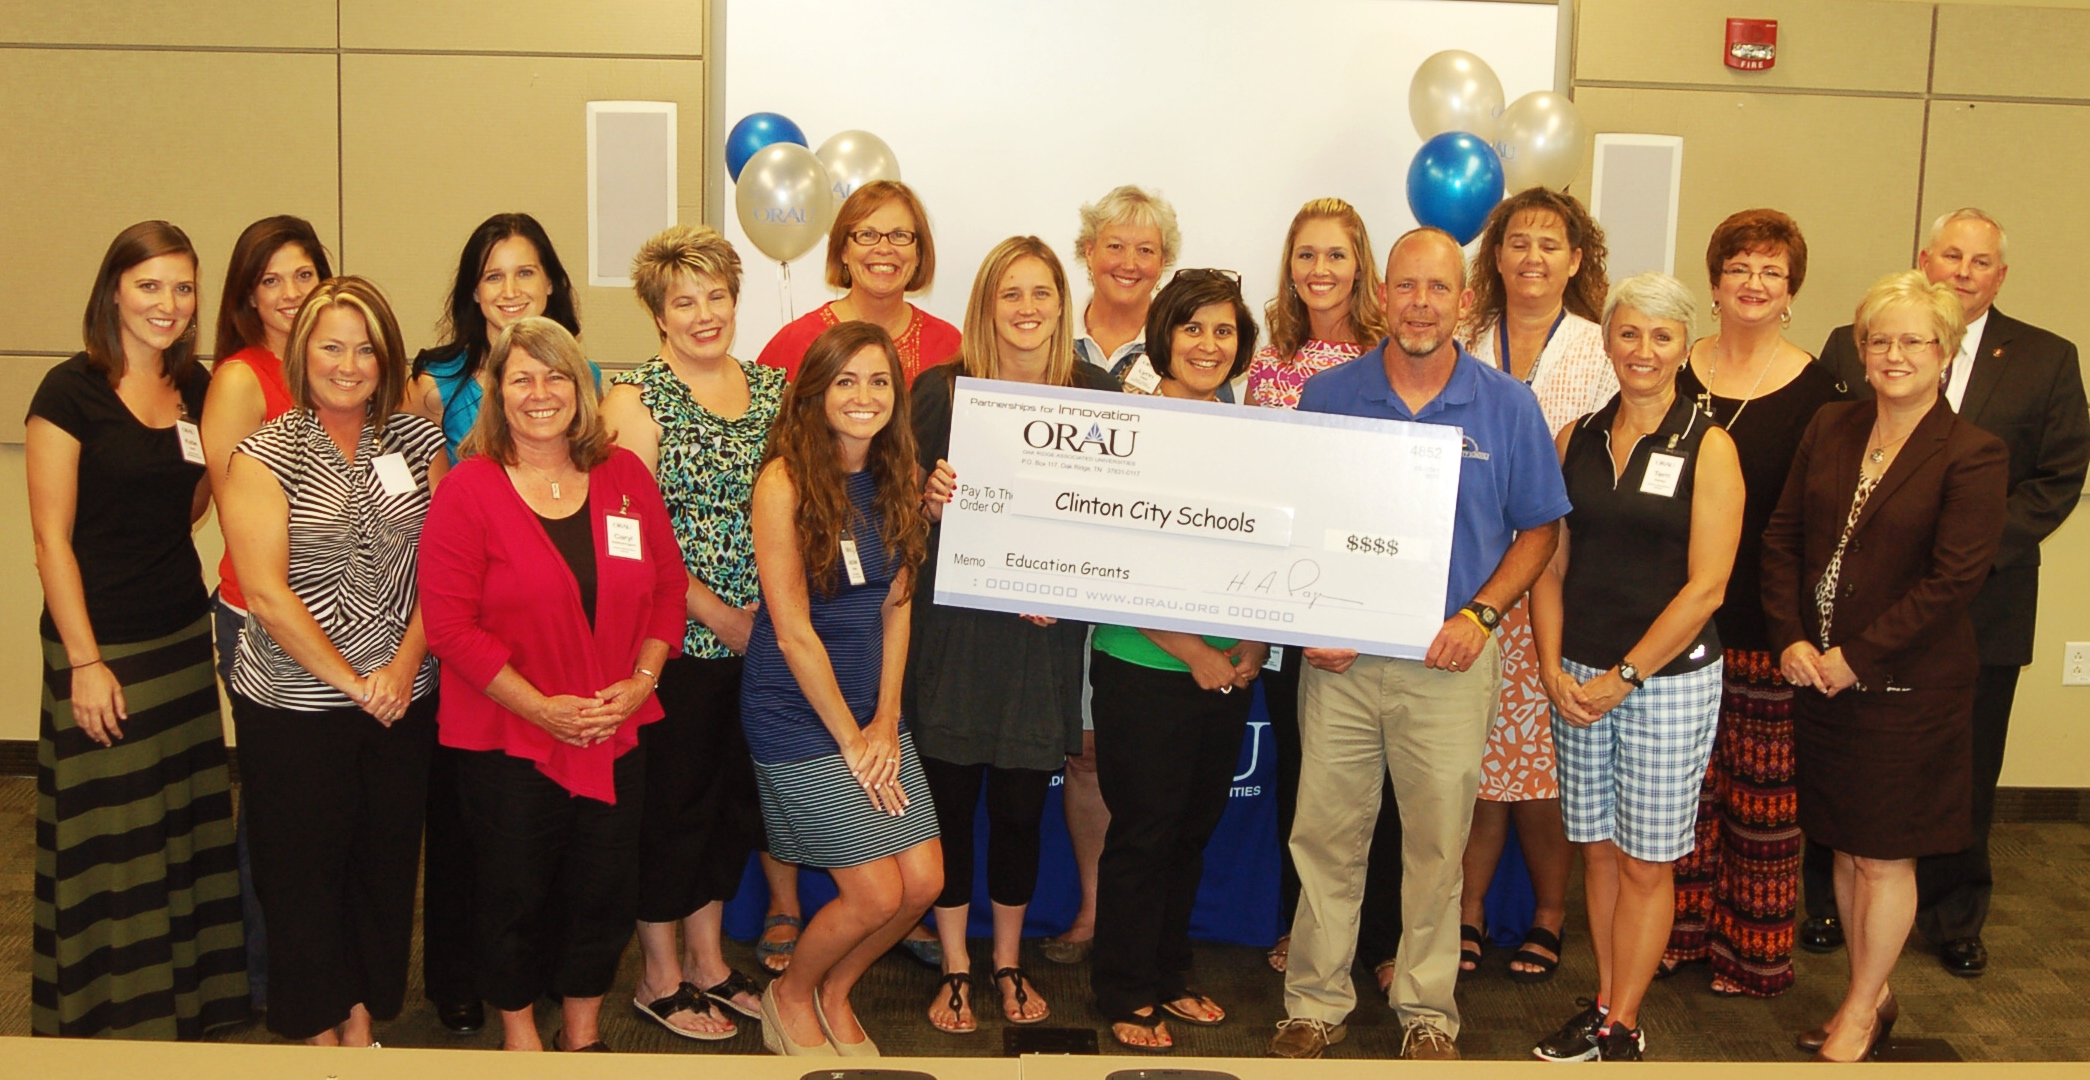 ORAU Grant Winners